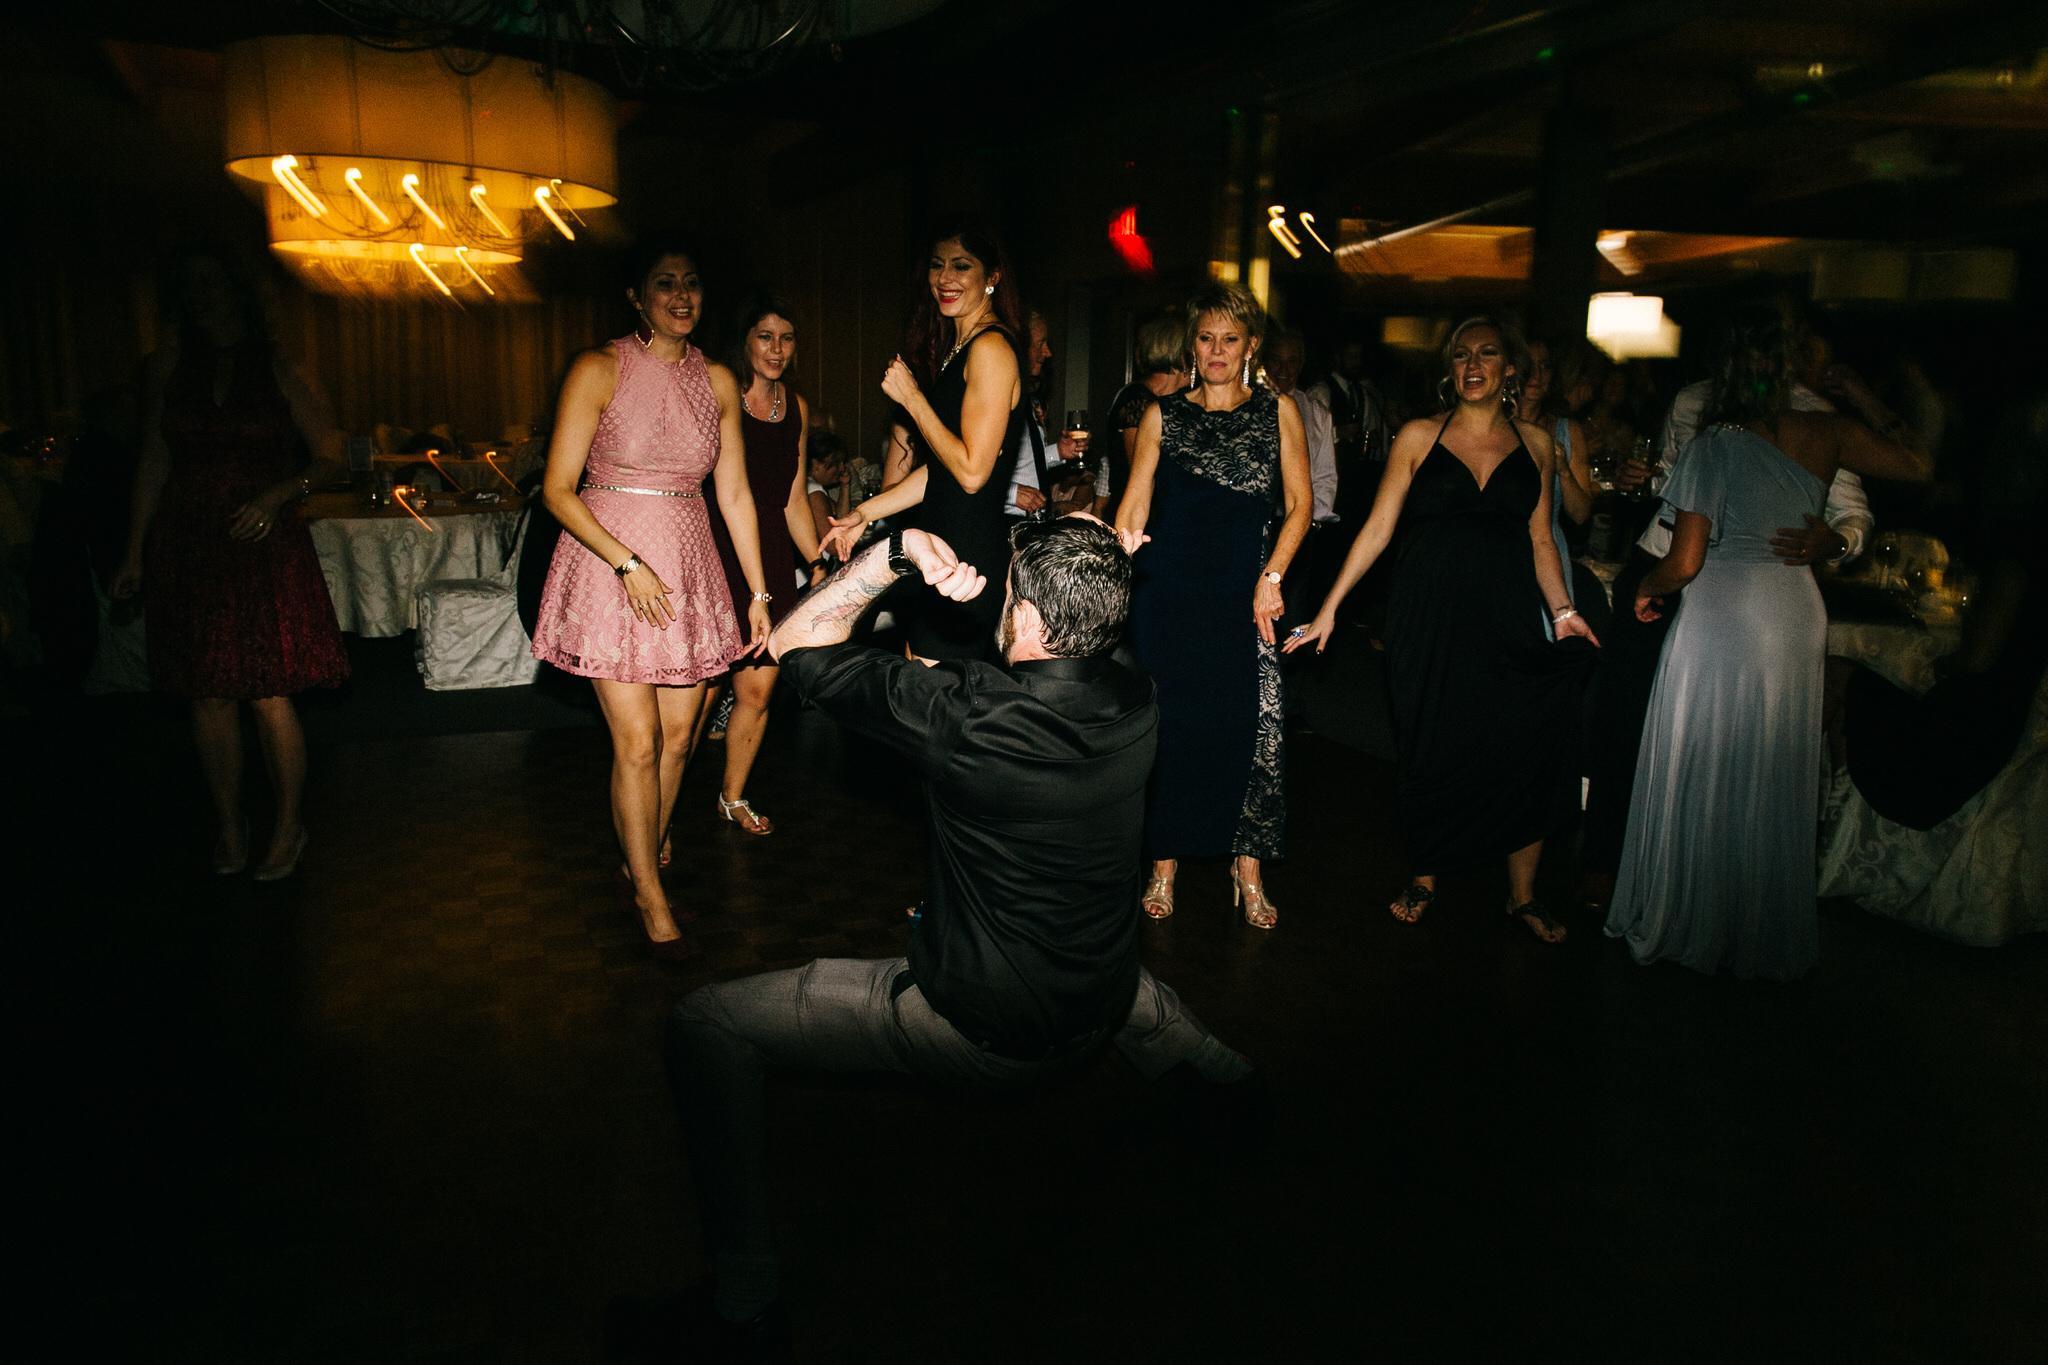 St. George Anglican Oshawa, Toronto wedding photographer, parkwood estates oshawa, oshawa golf and curling club